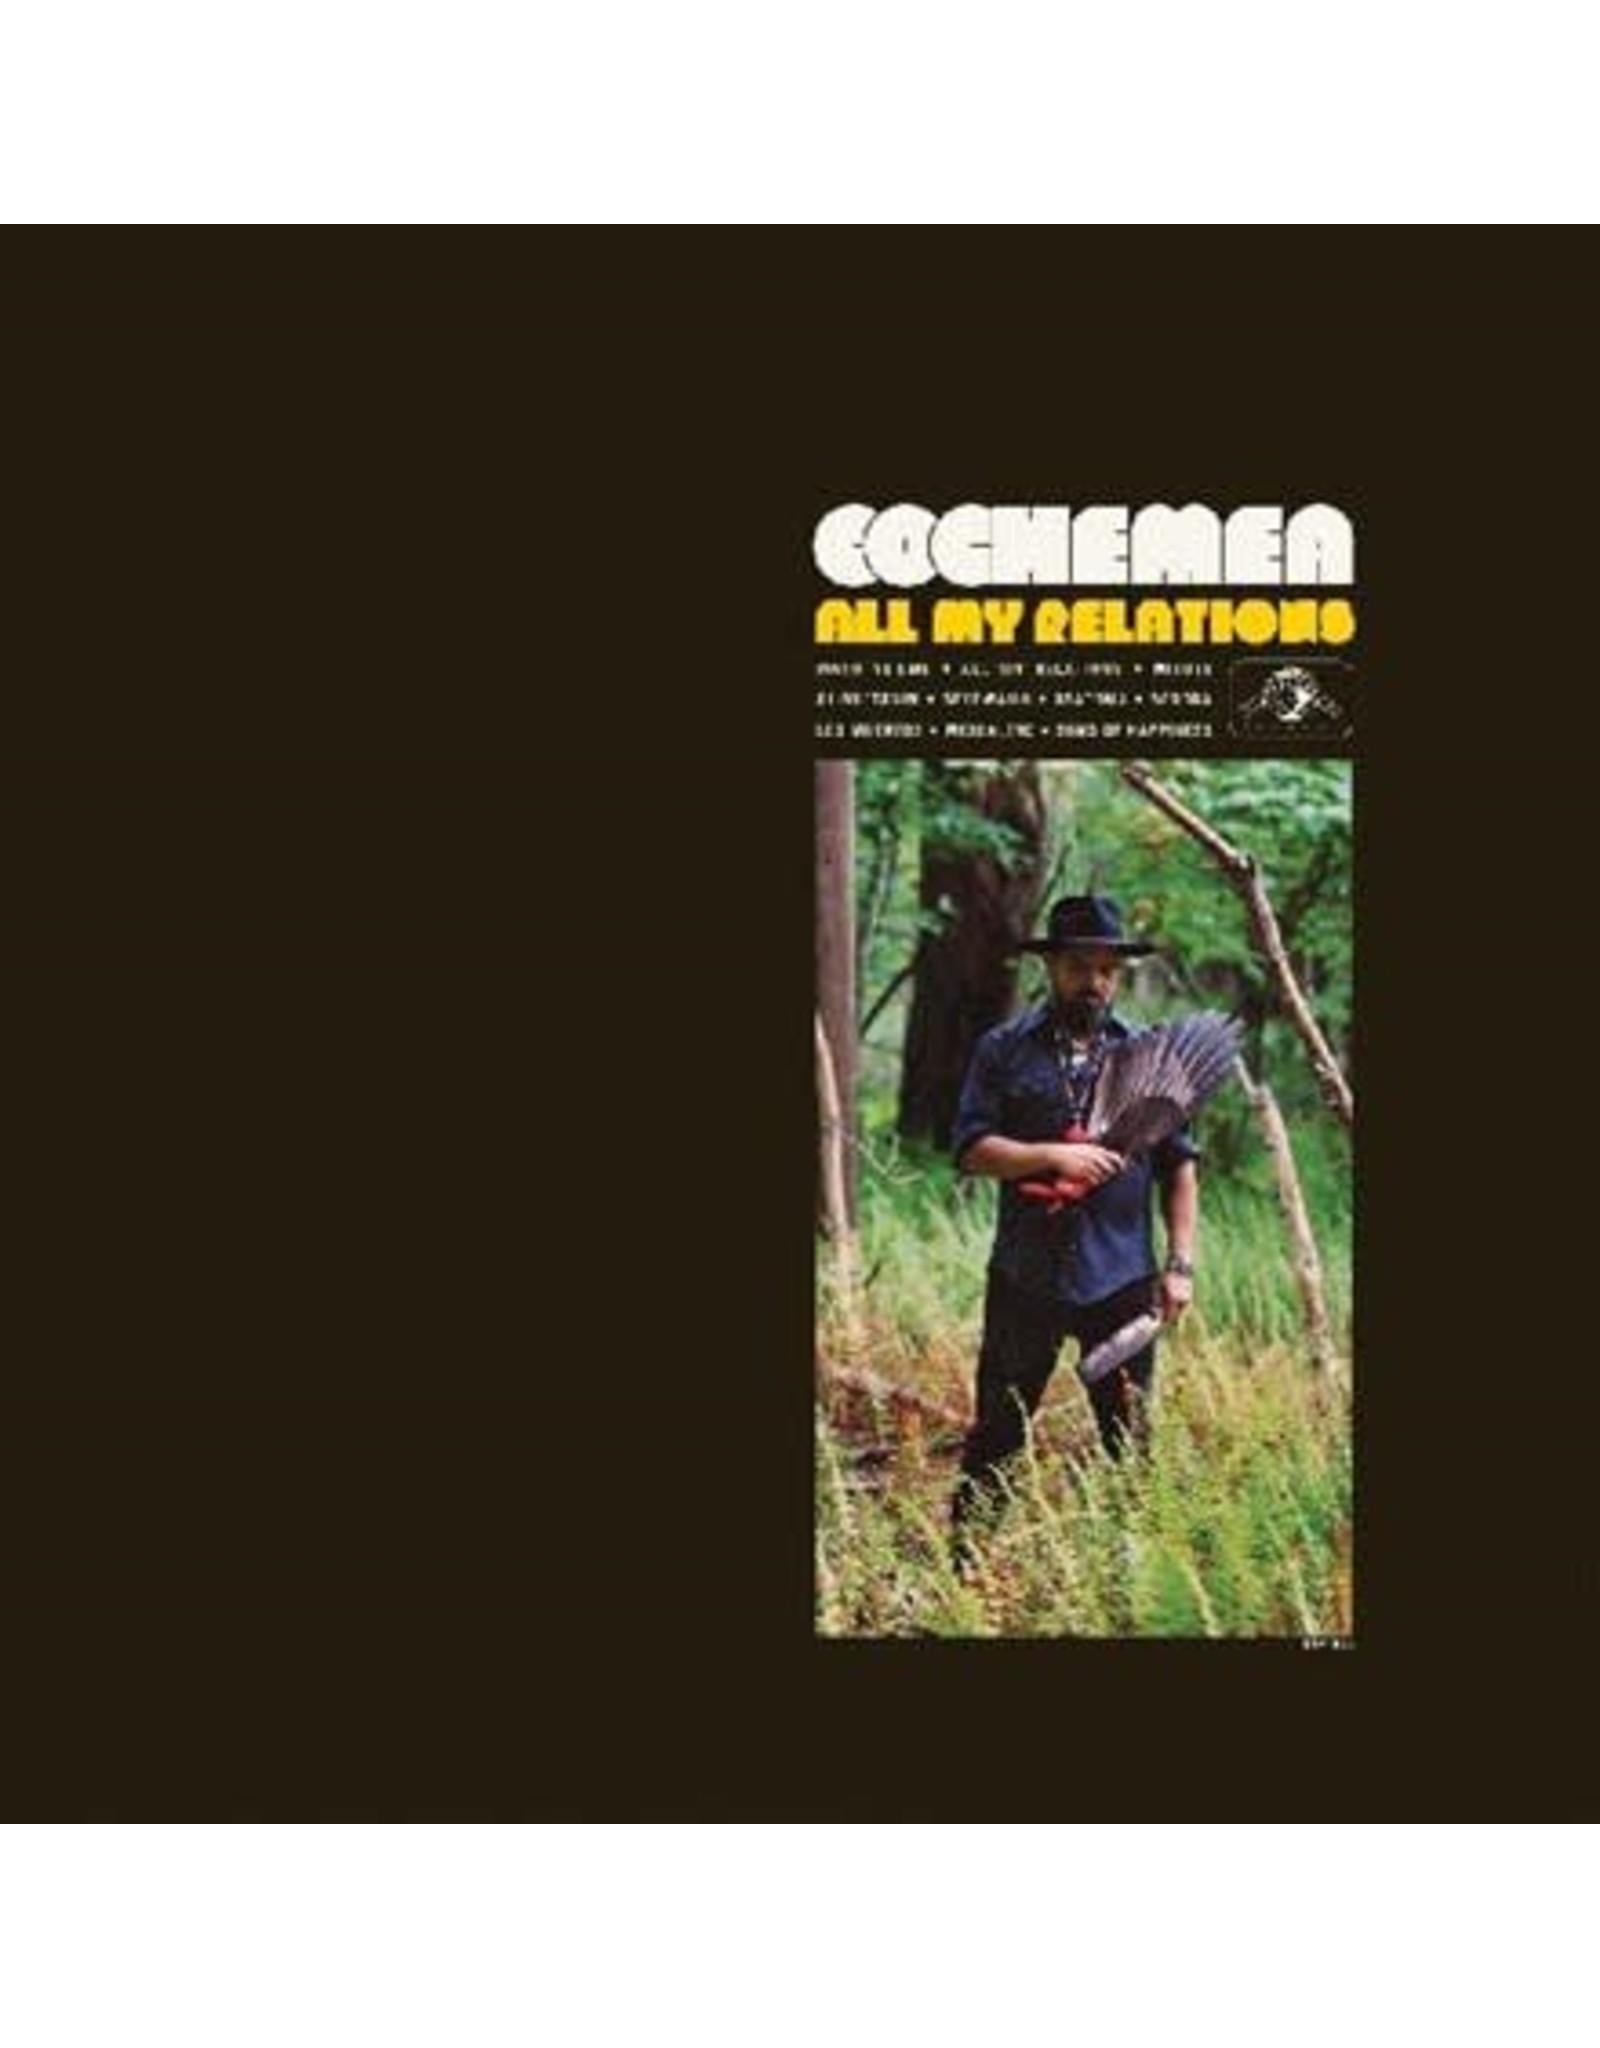 Daptone Cochema: All My Relations LP